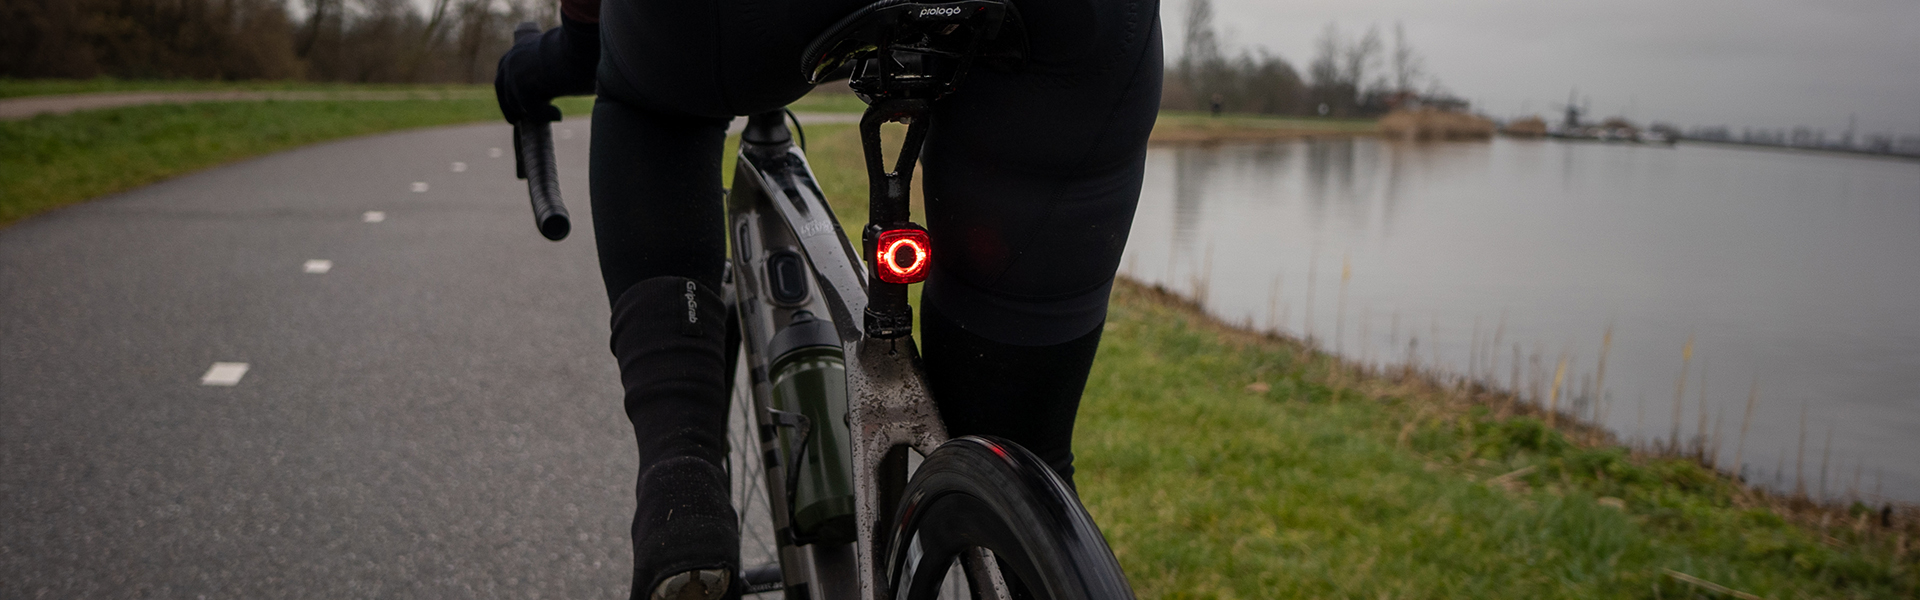 Sate-lite OSRAM 20lux ebike light ISO 6721-1 StVZO  eletric bike headlight with ECE ISO 6742-2 StVZO reflector front fork 6-58V